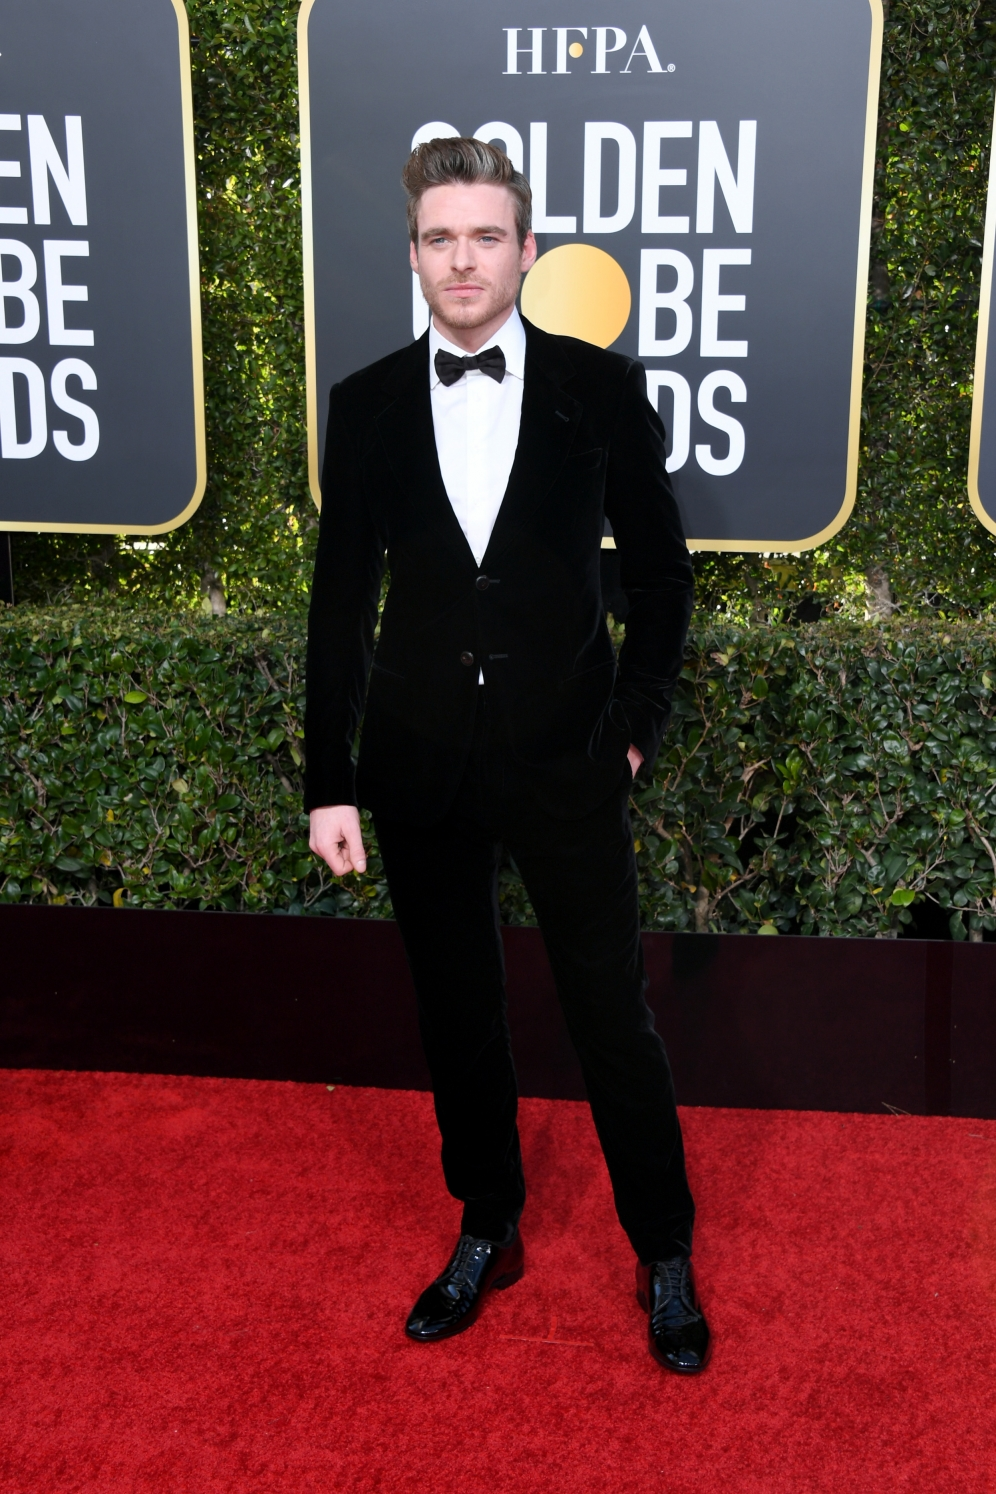 Richard Madden | Golden Globes 2019